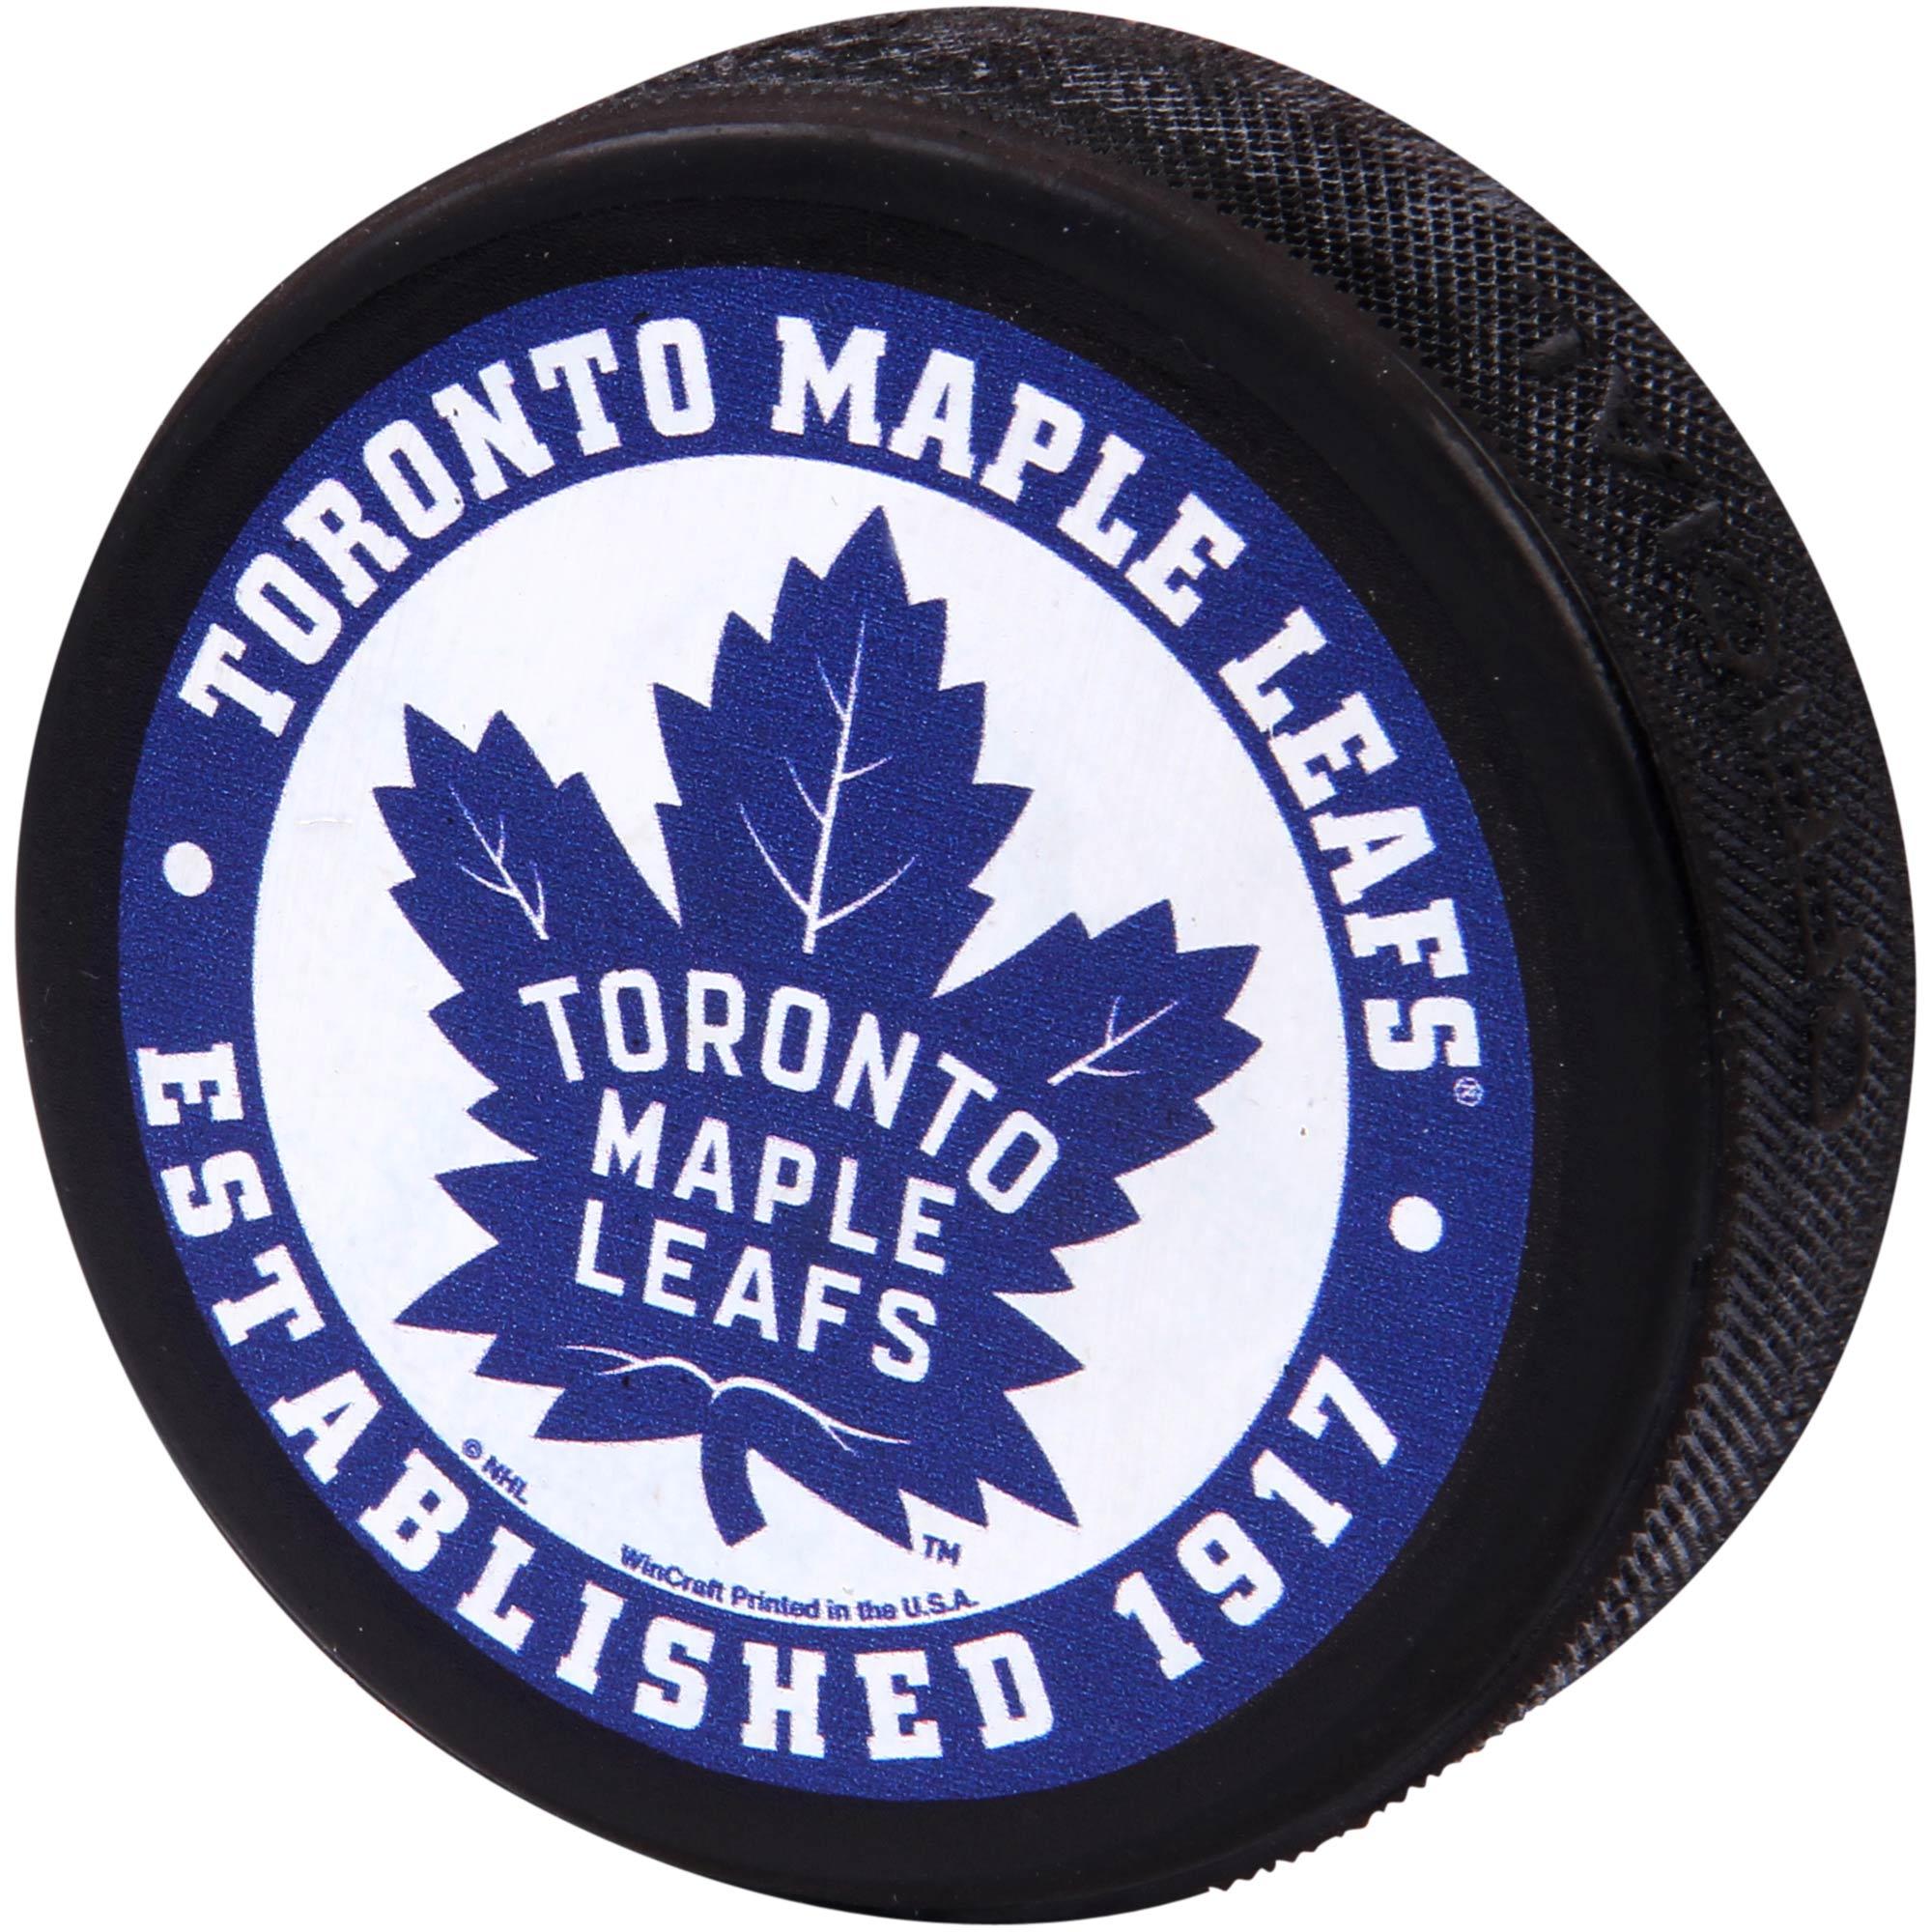 Toronto Maple Leafs WinCraft Printed Hockey Puck - No Size